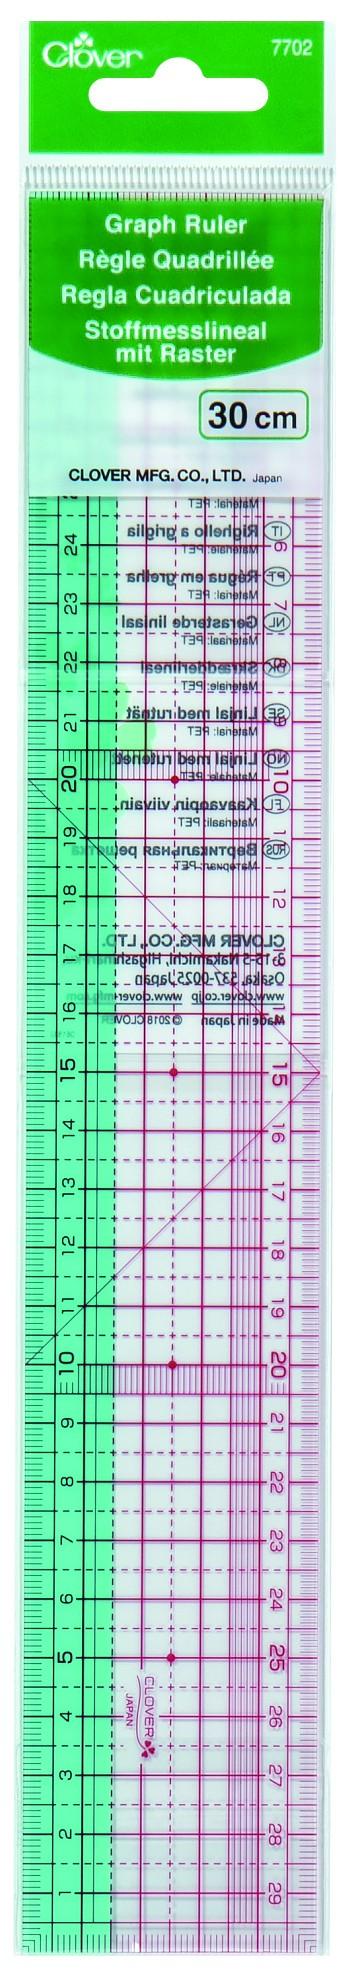 CLOVER Stoffmesslineal m. Raster 30cm